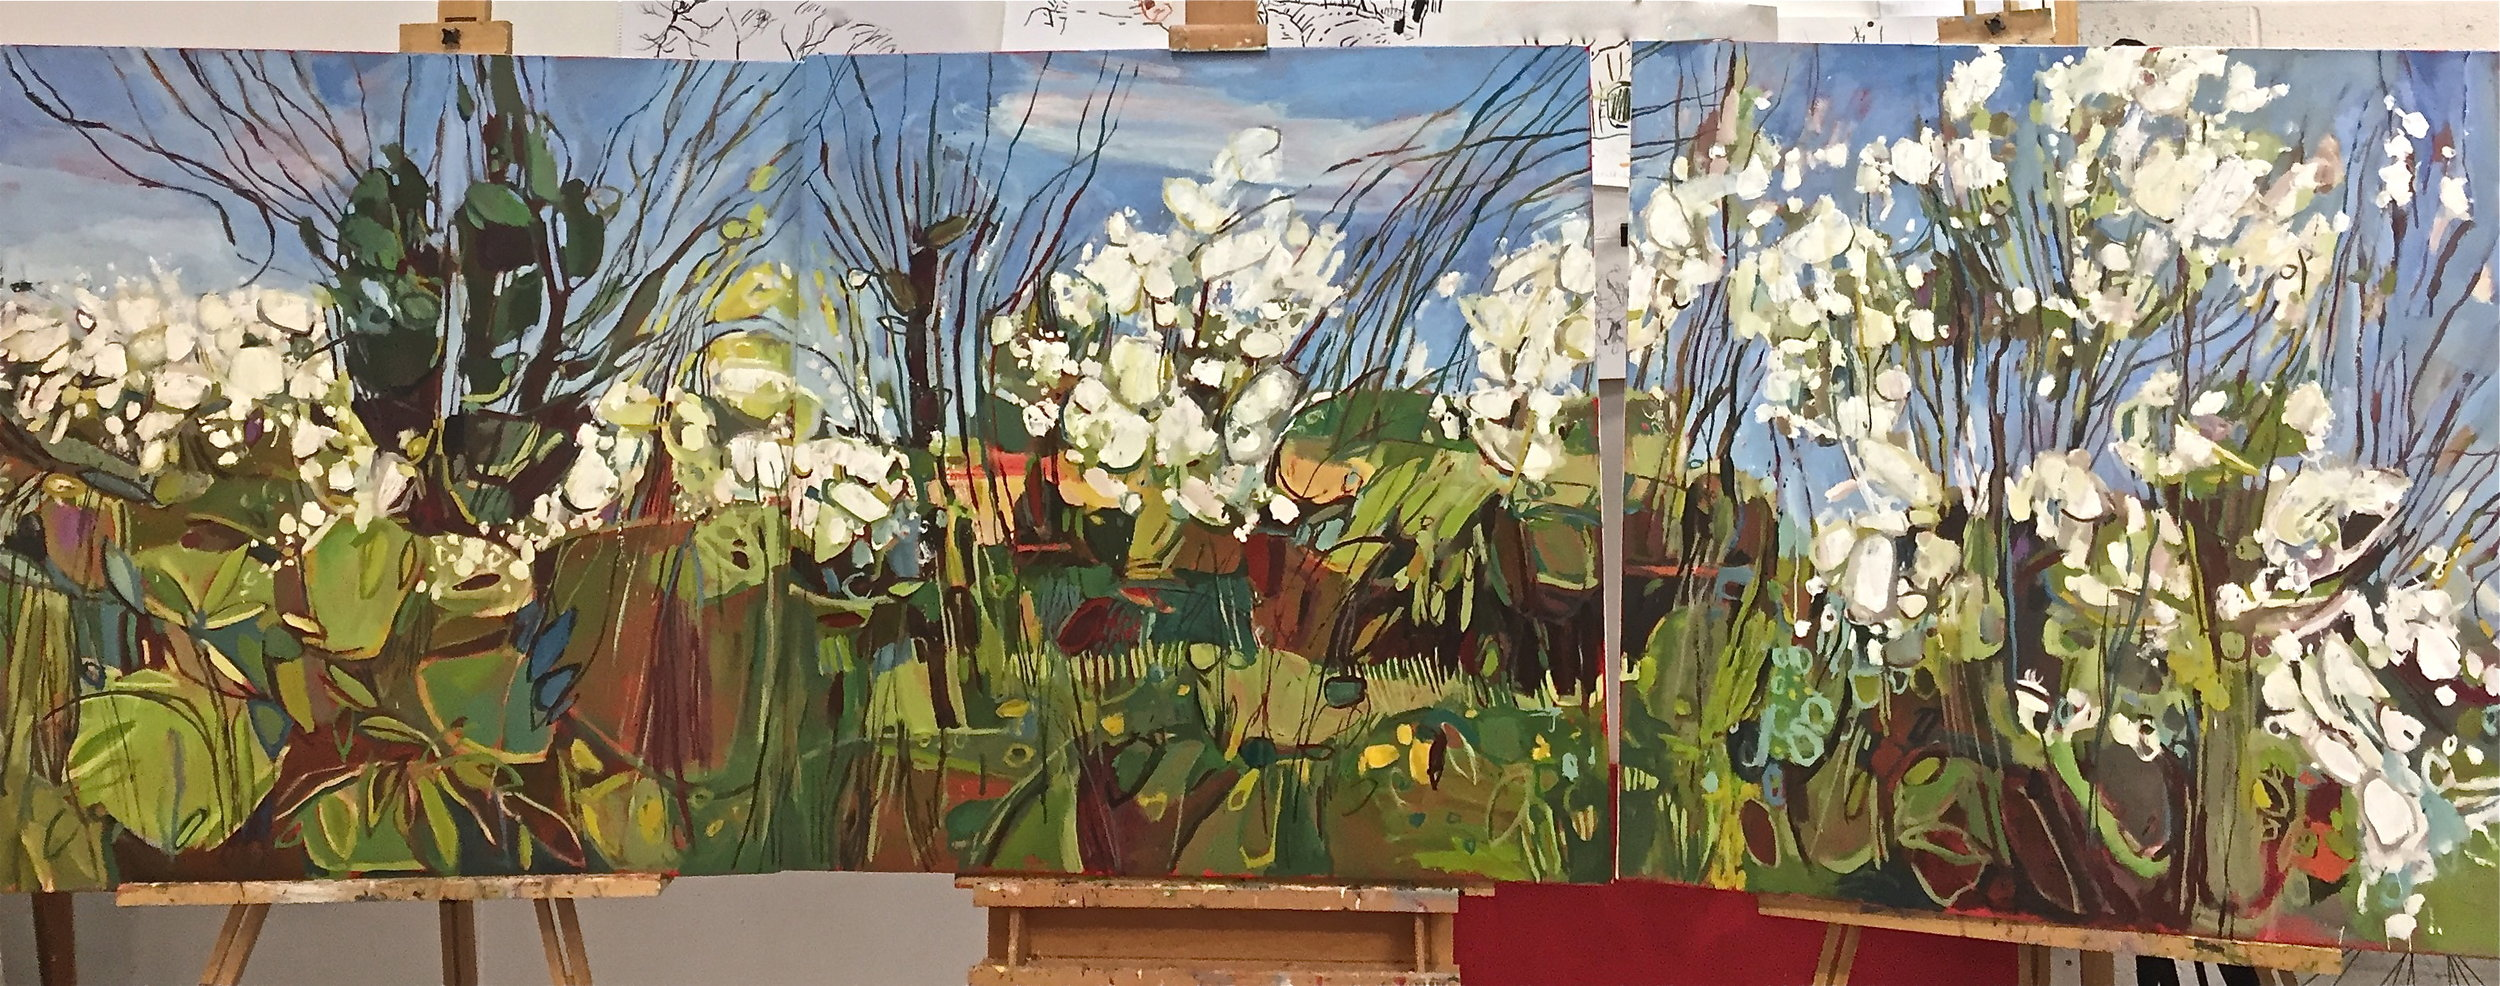 April Hedgerow, Burford, full triptych